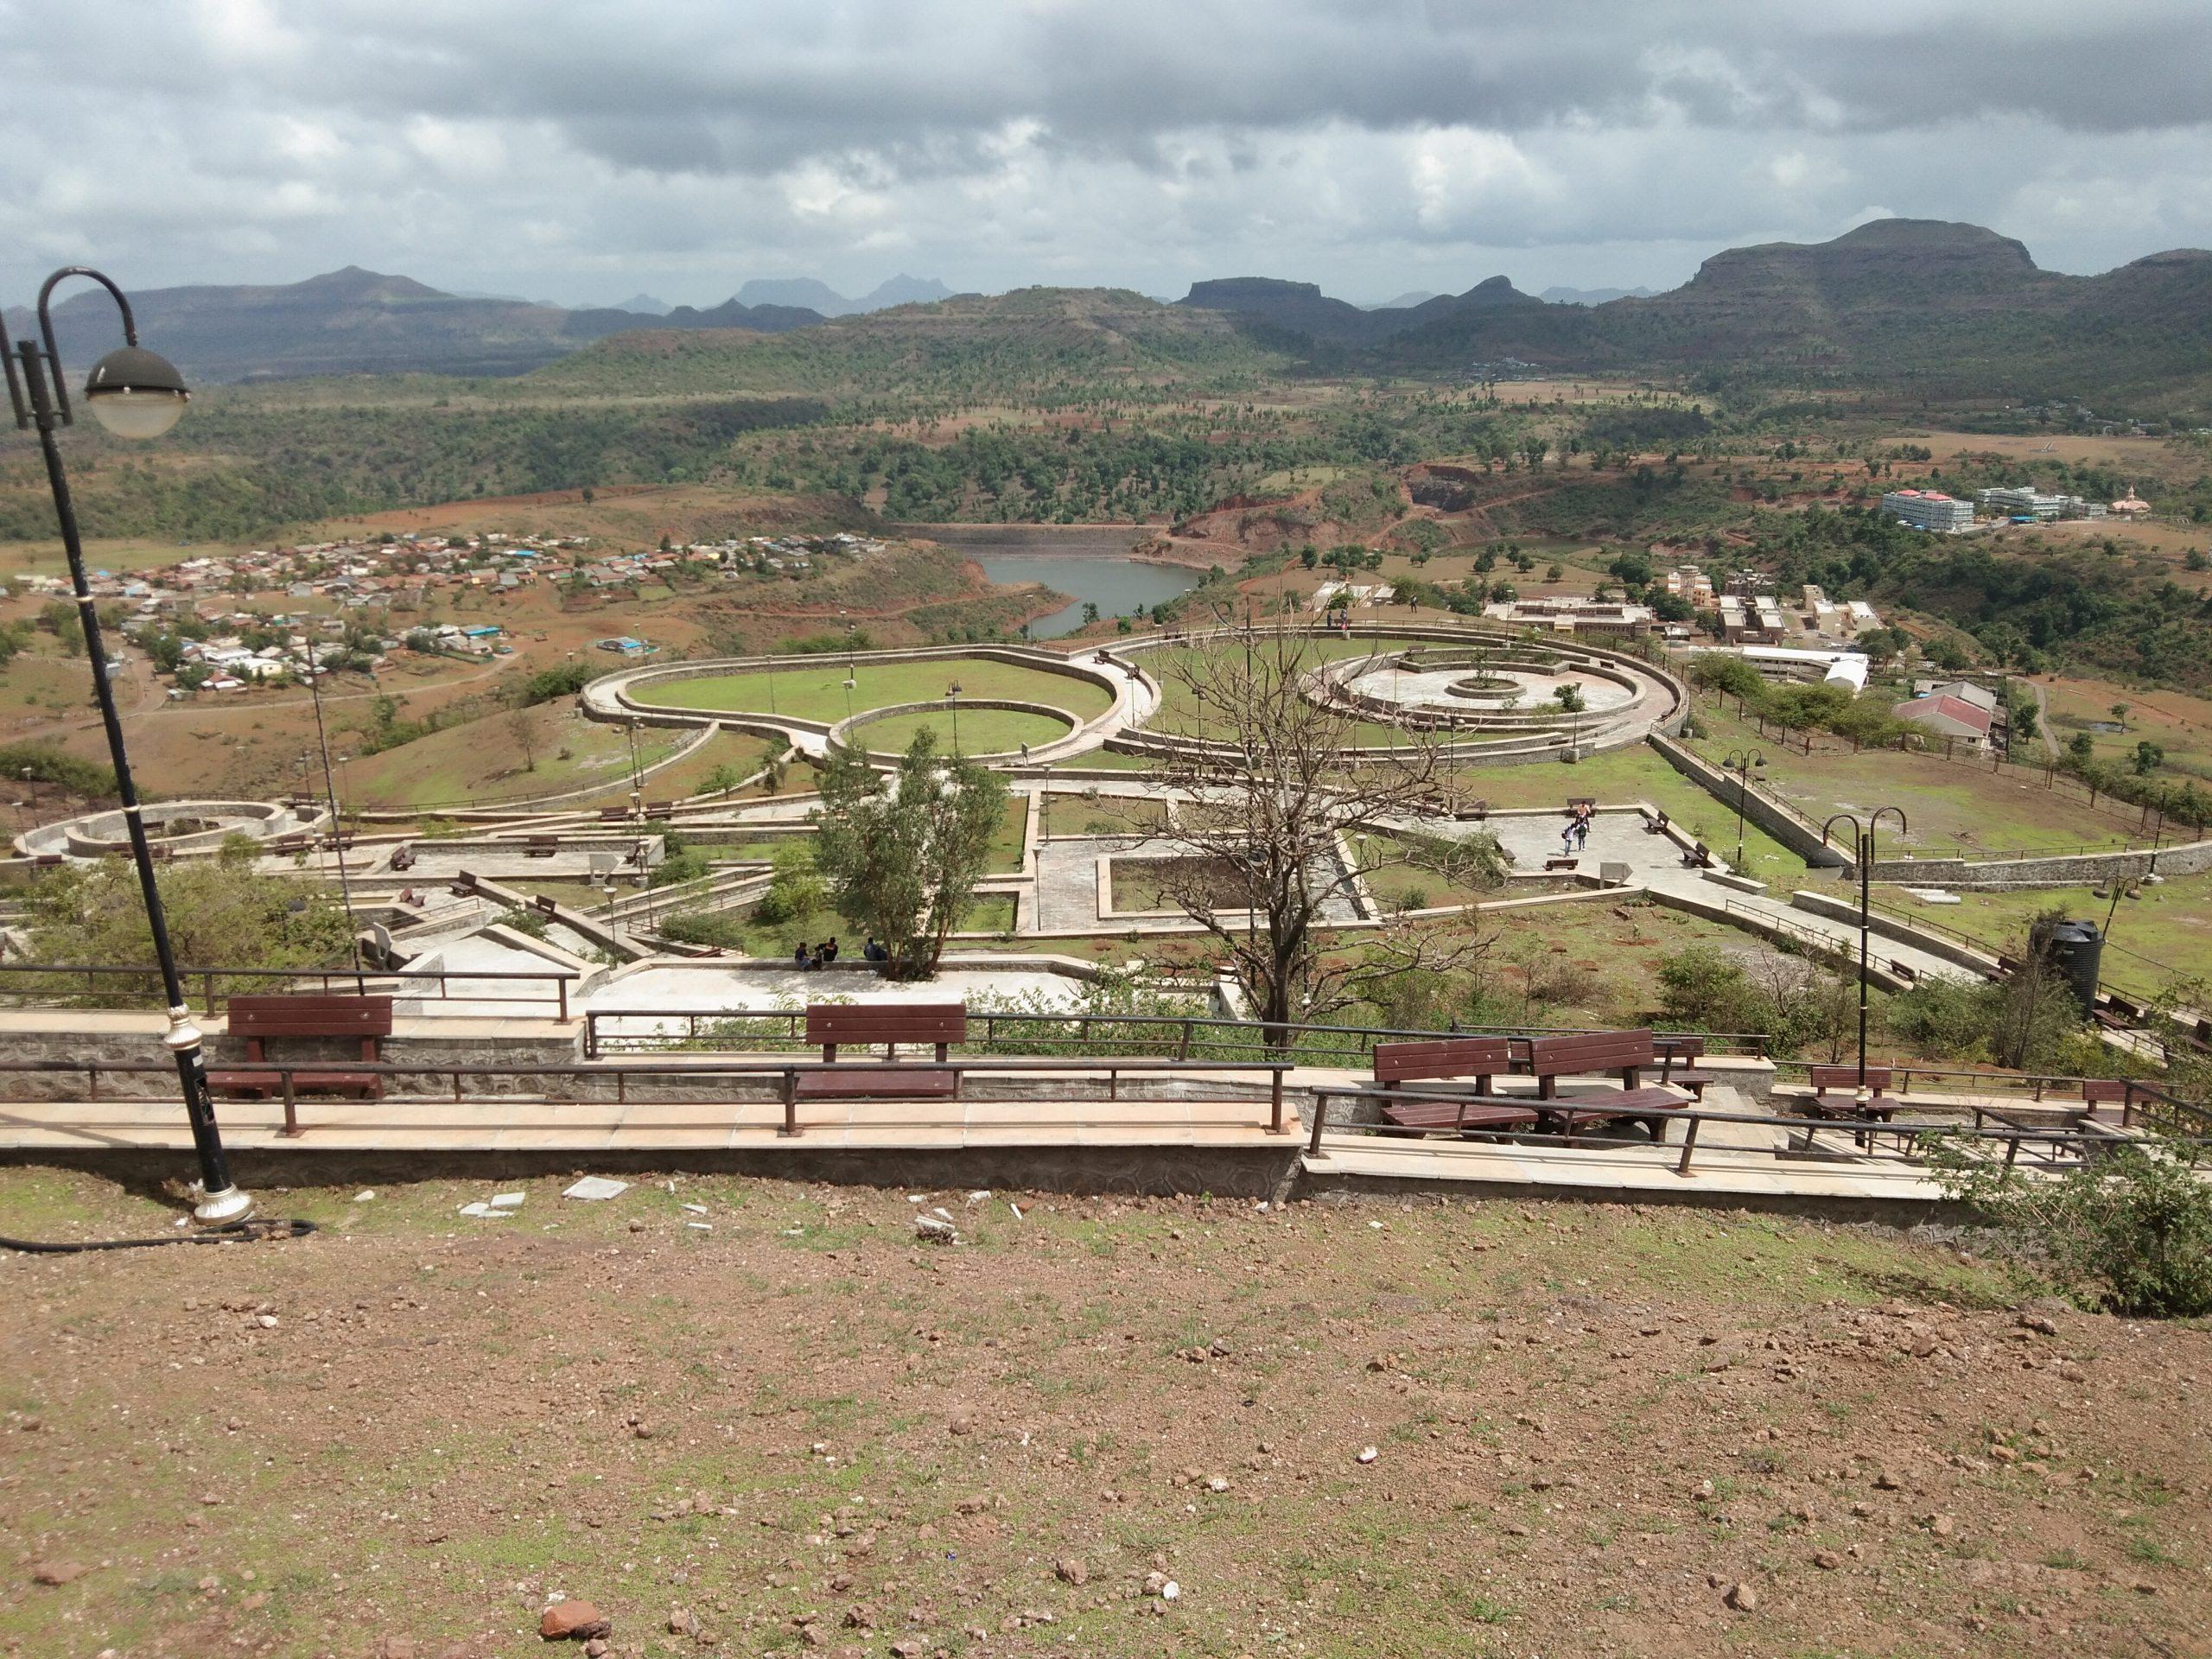 A view of a park